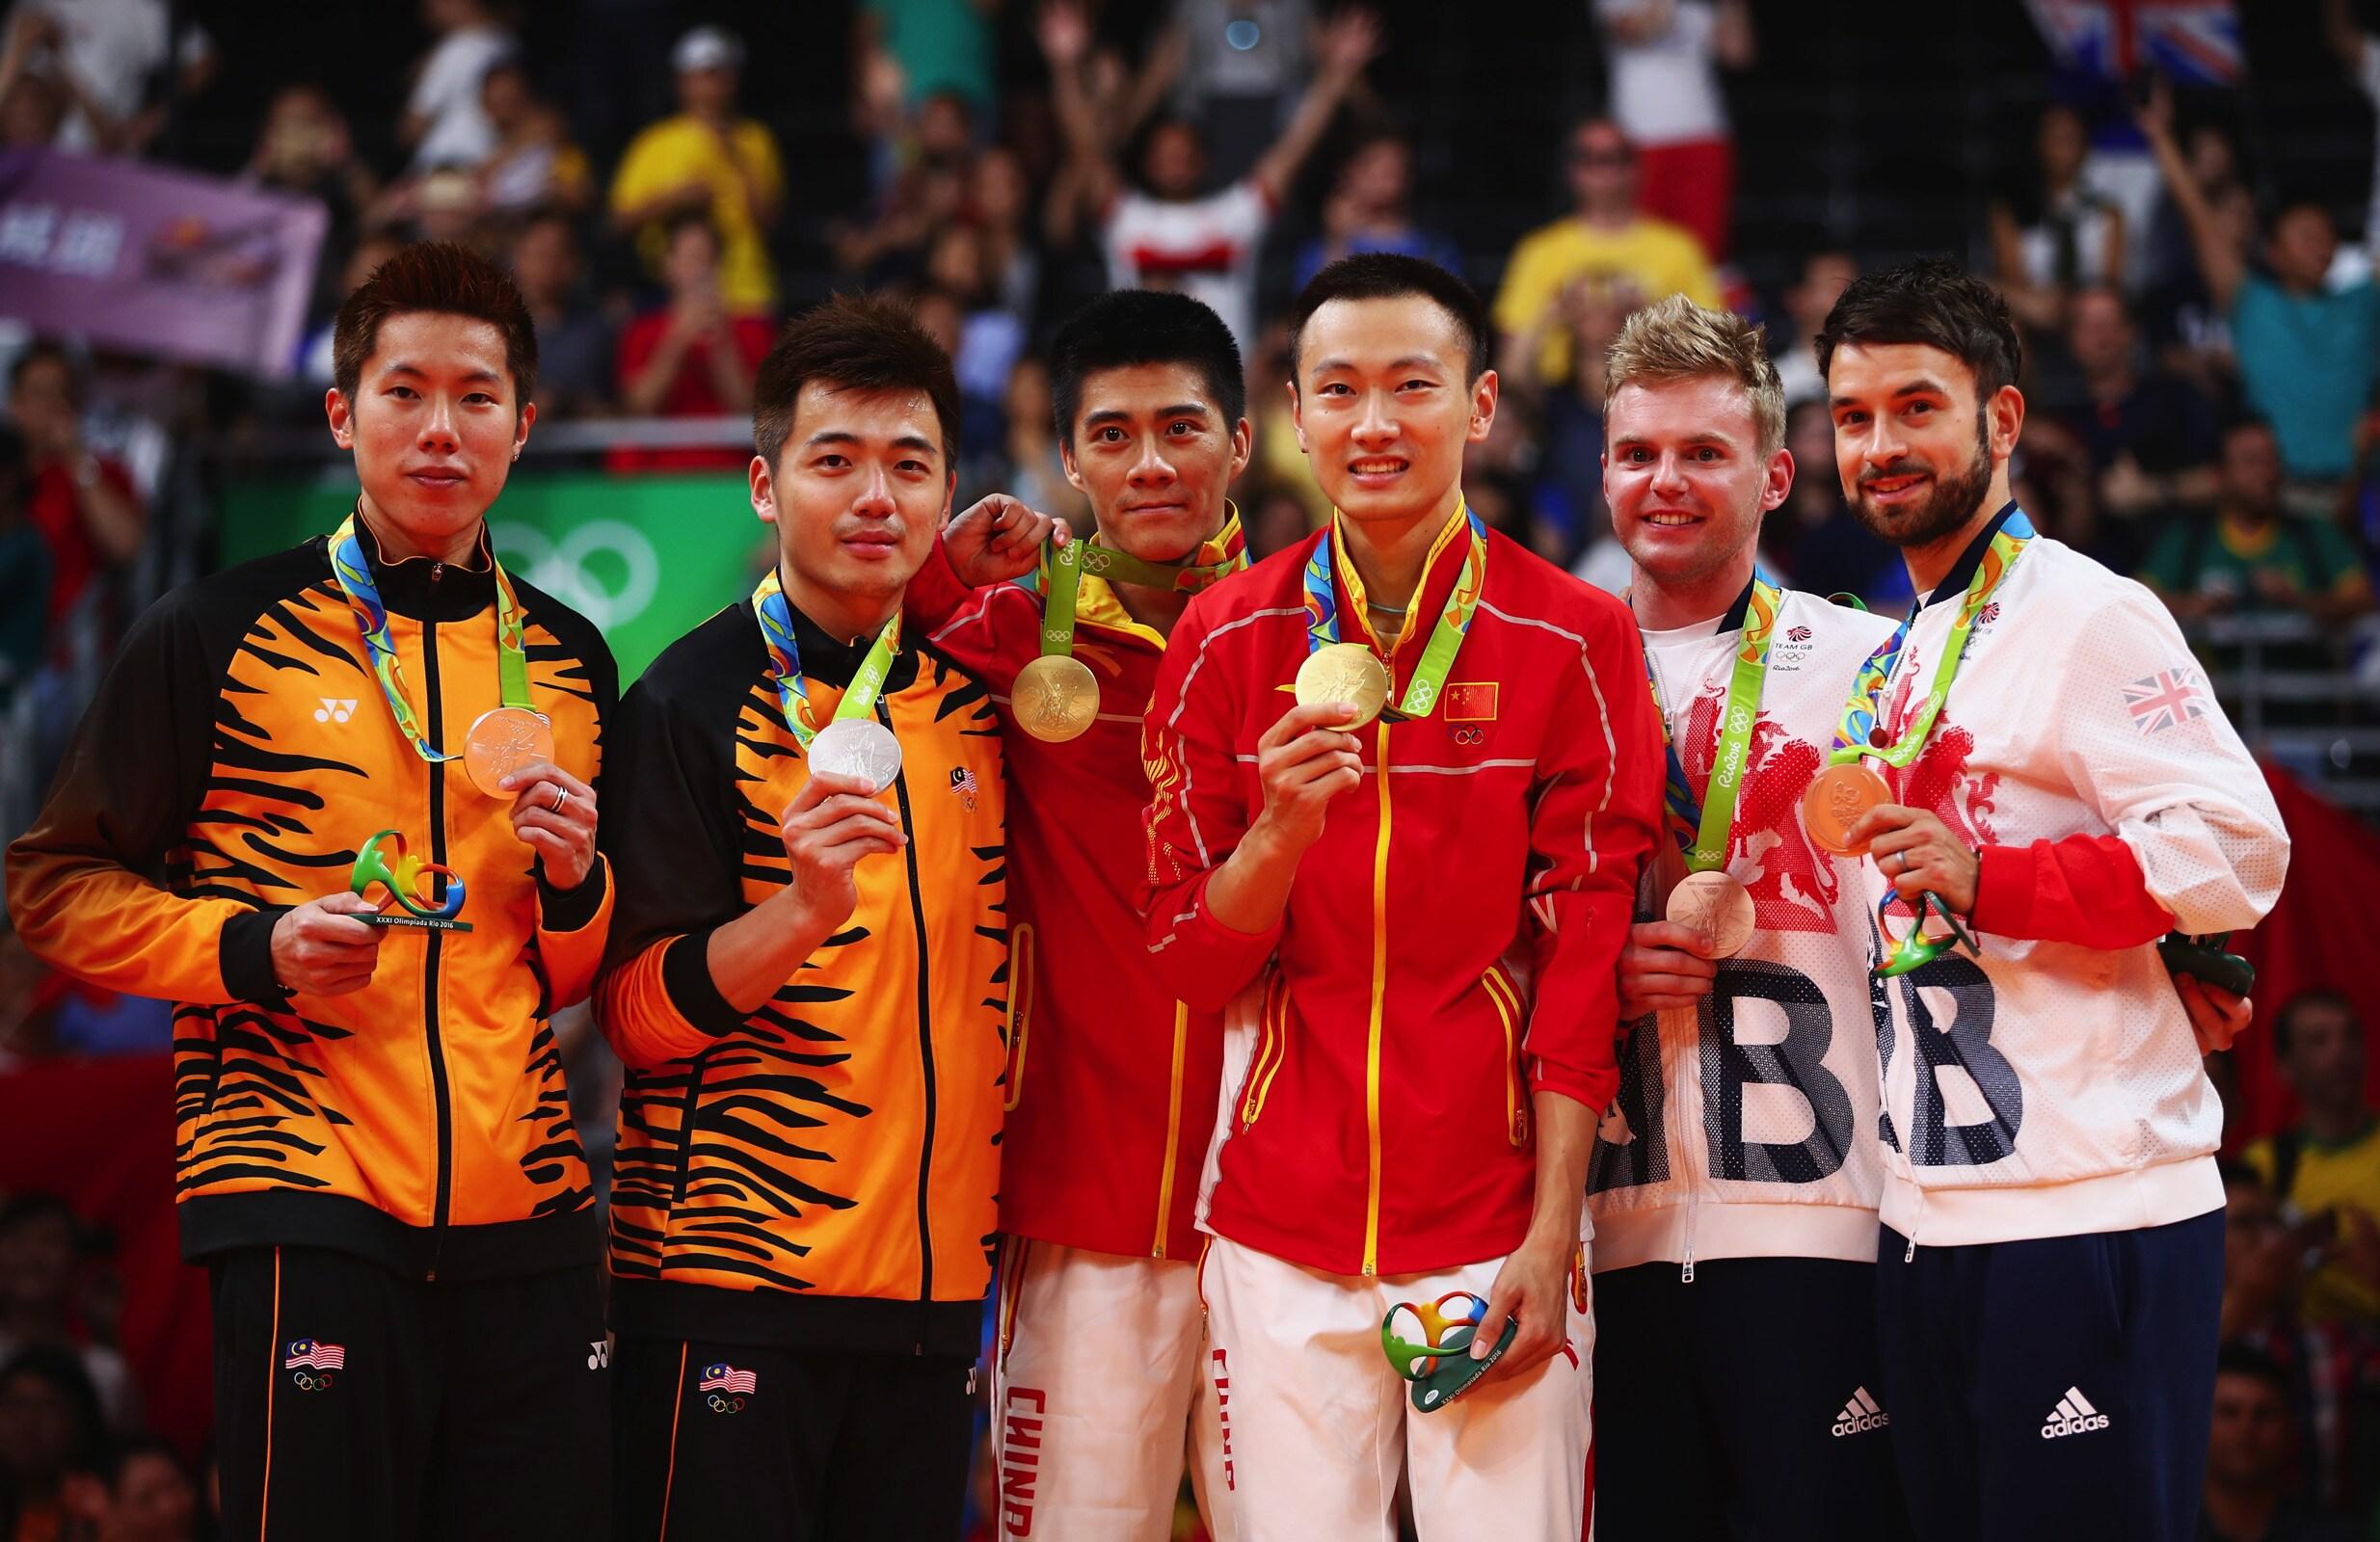 Badminton - Doubles Men